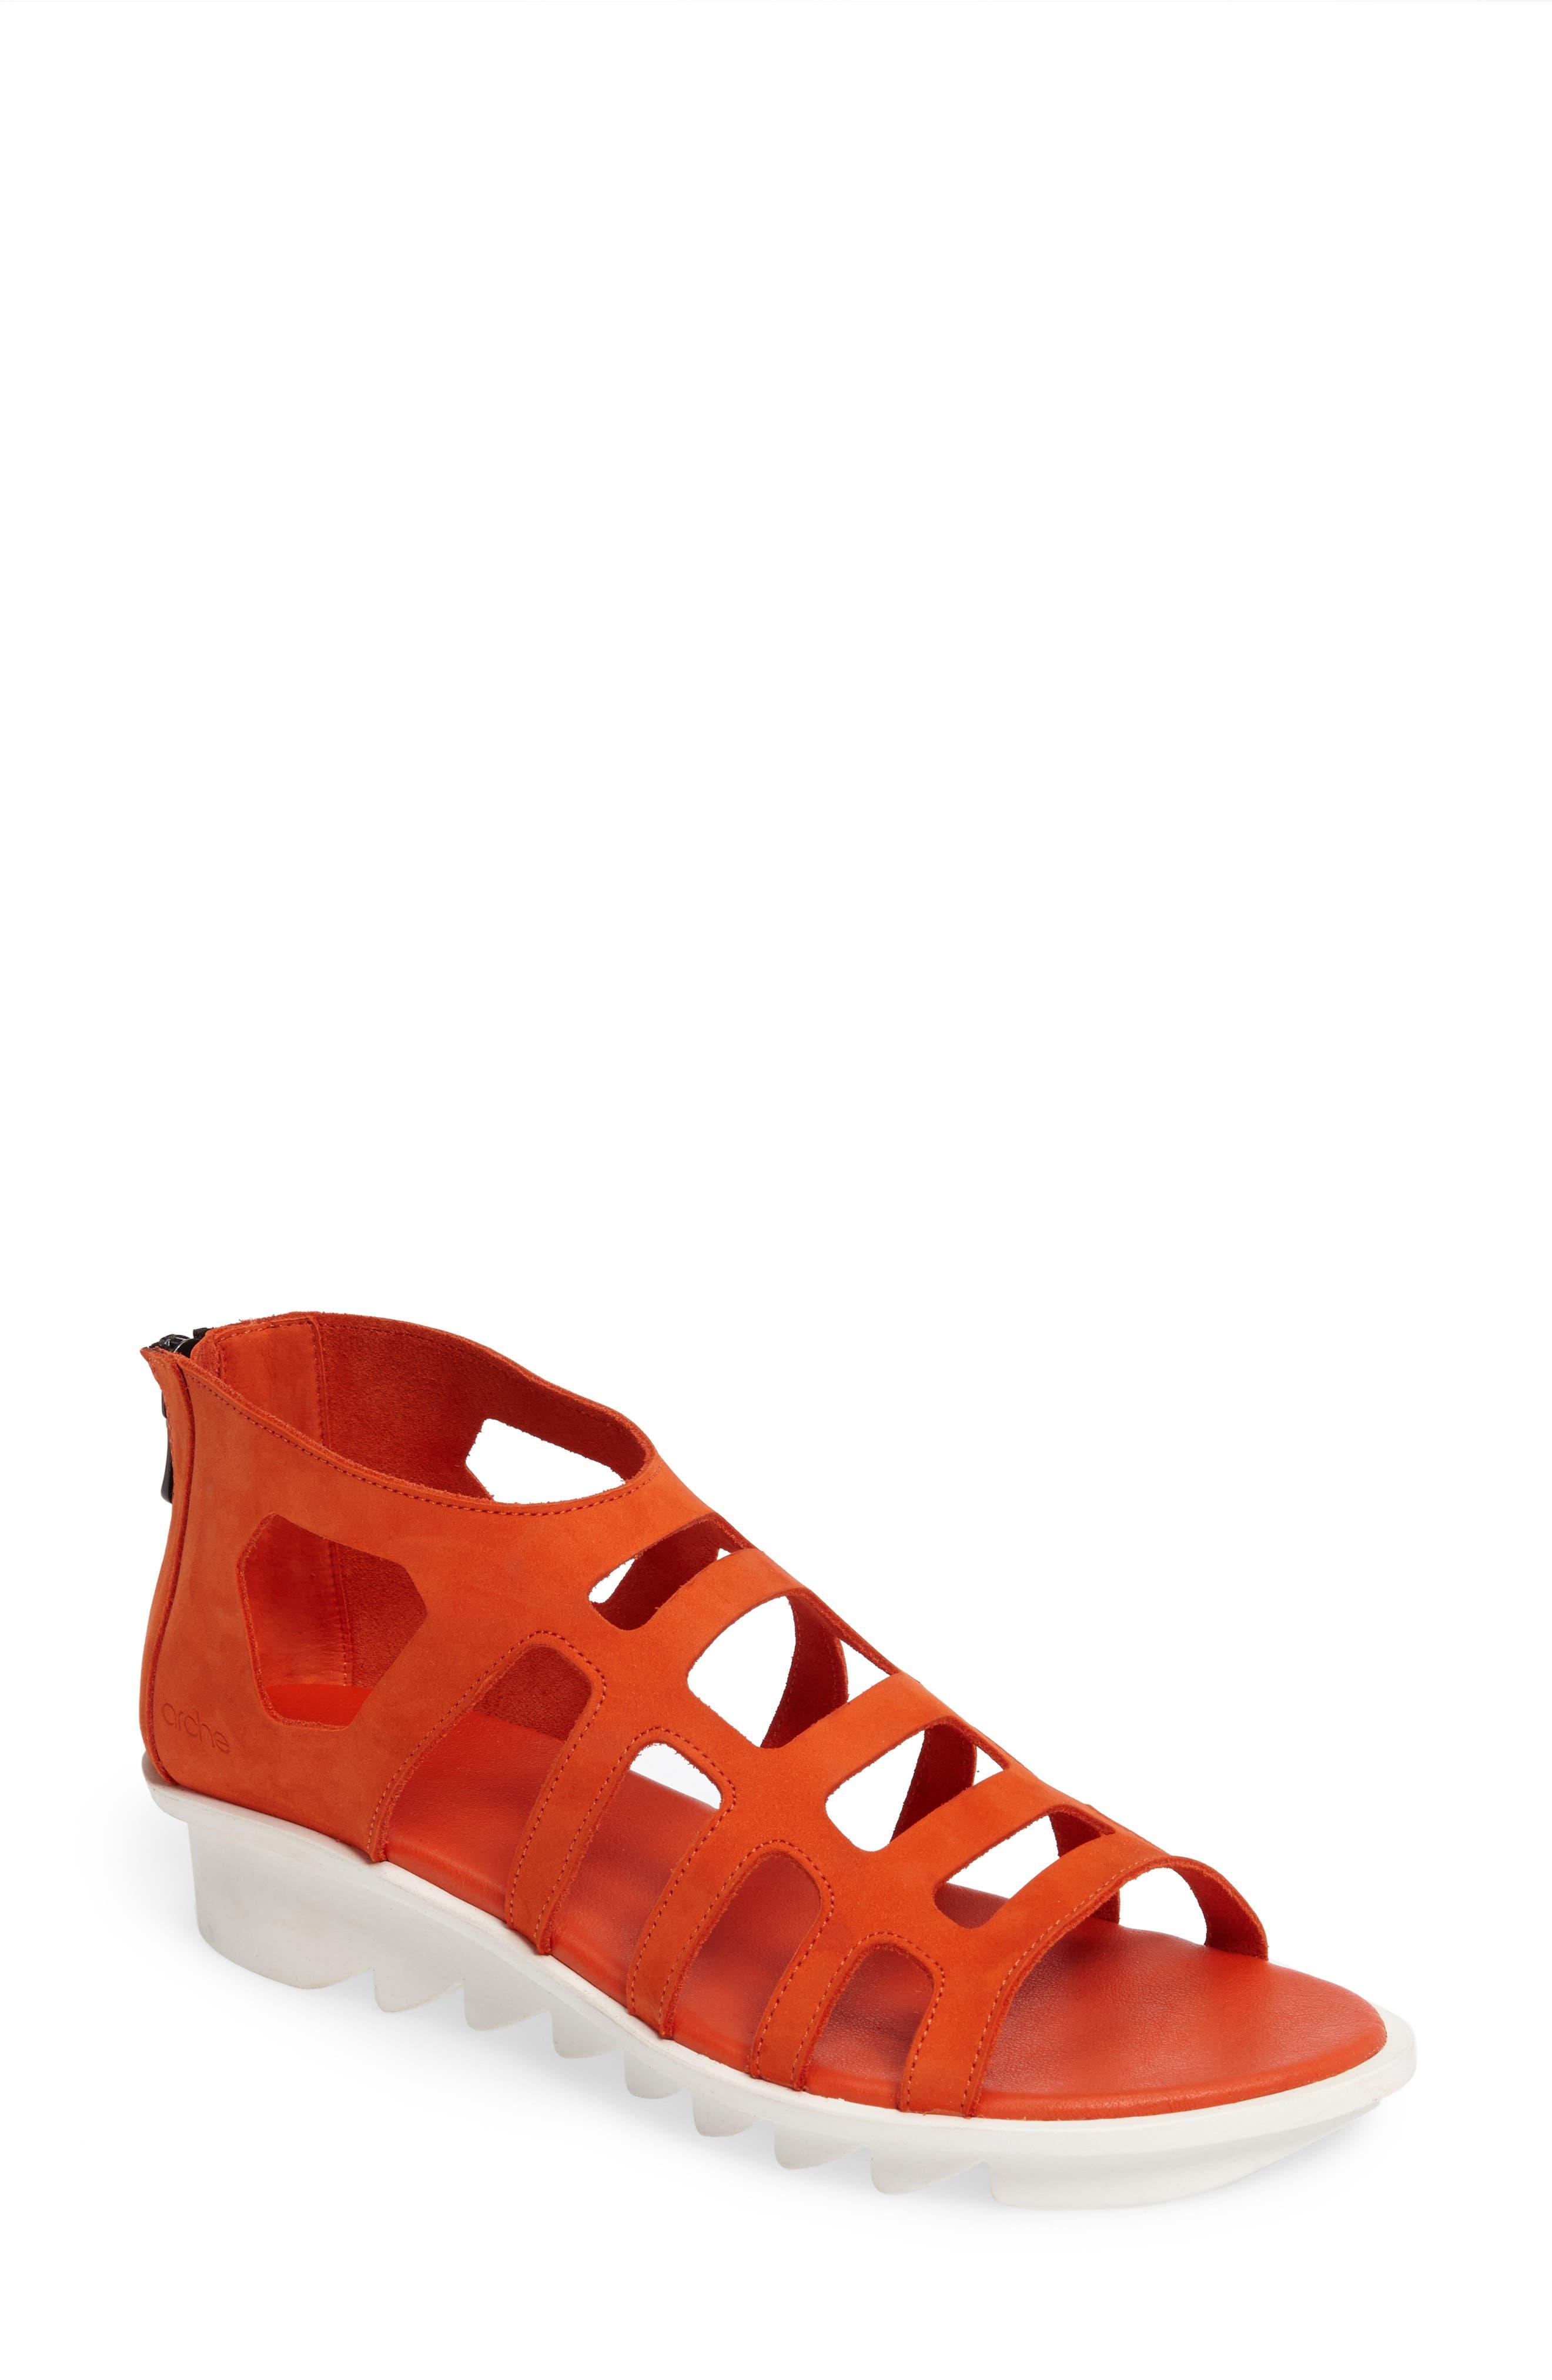 Alternate Image 1 Selected - Arche Ikyade Sandal (Women)